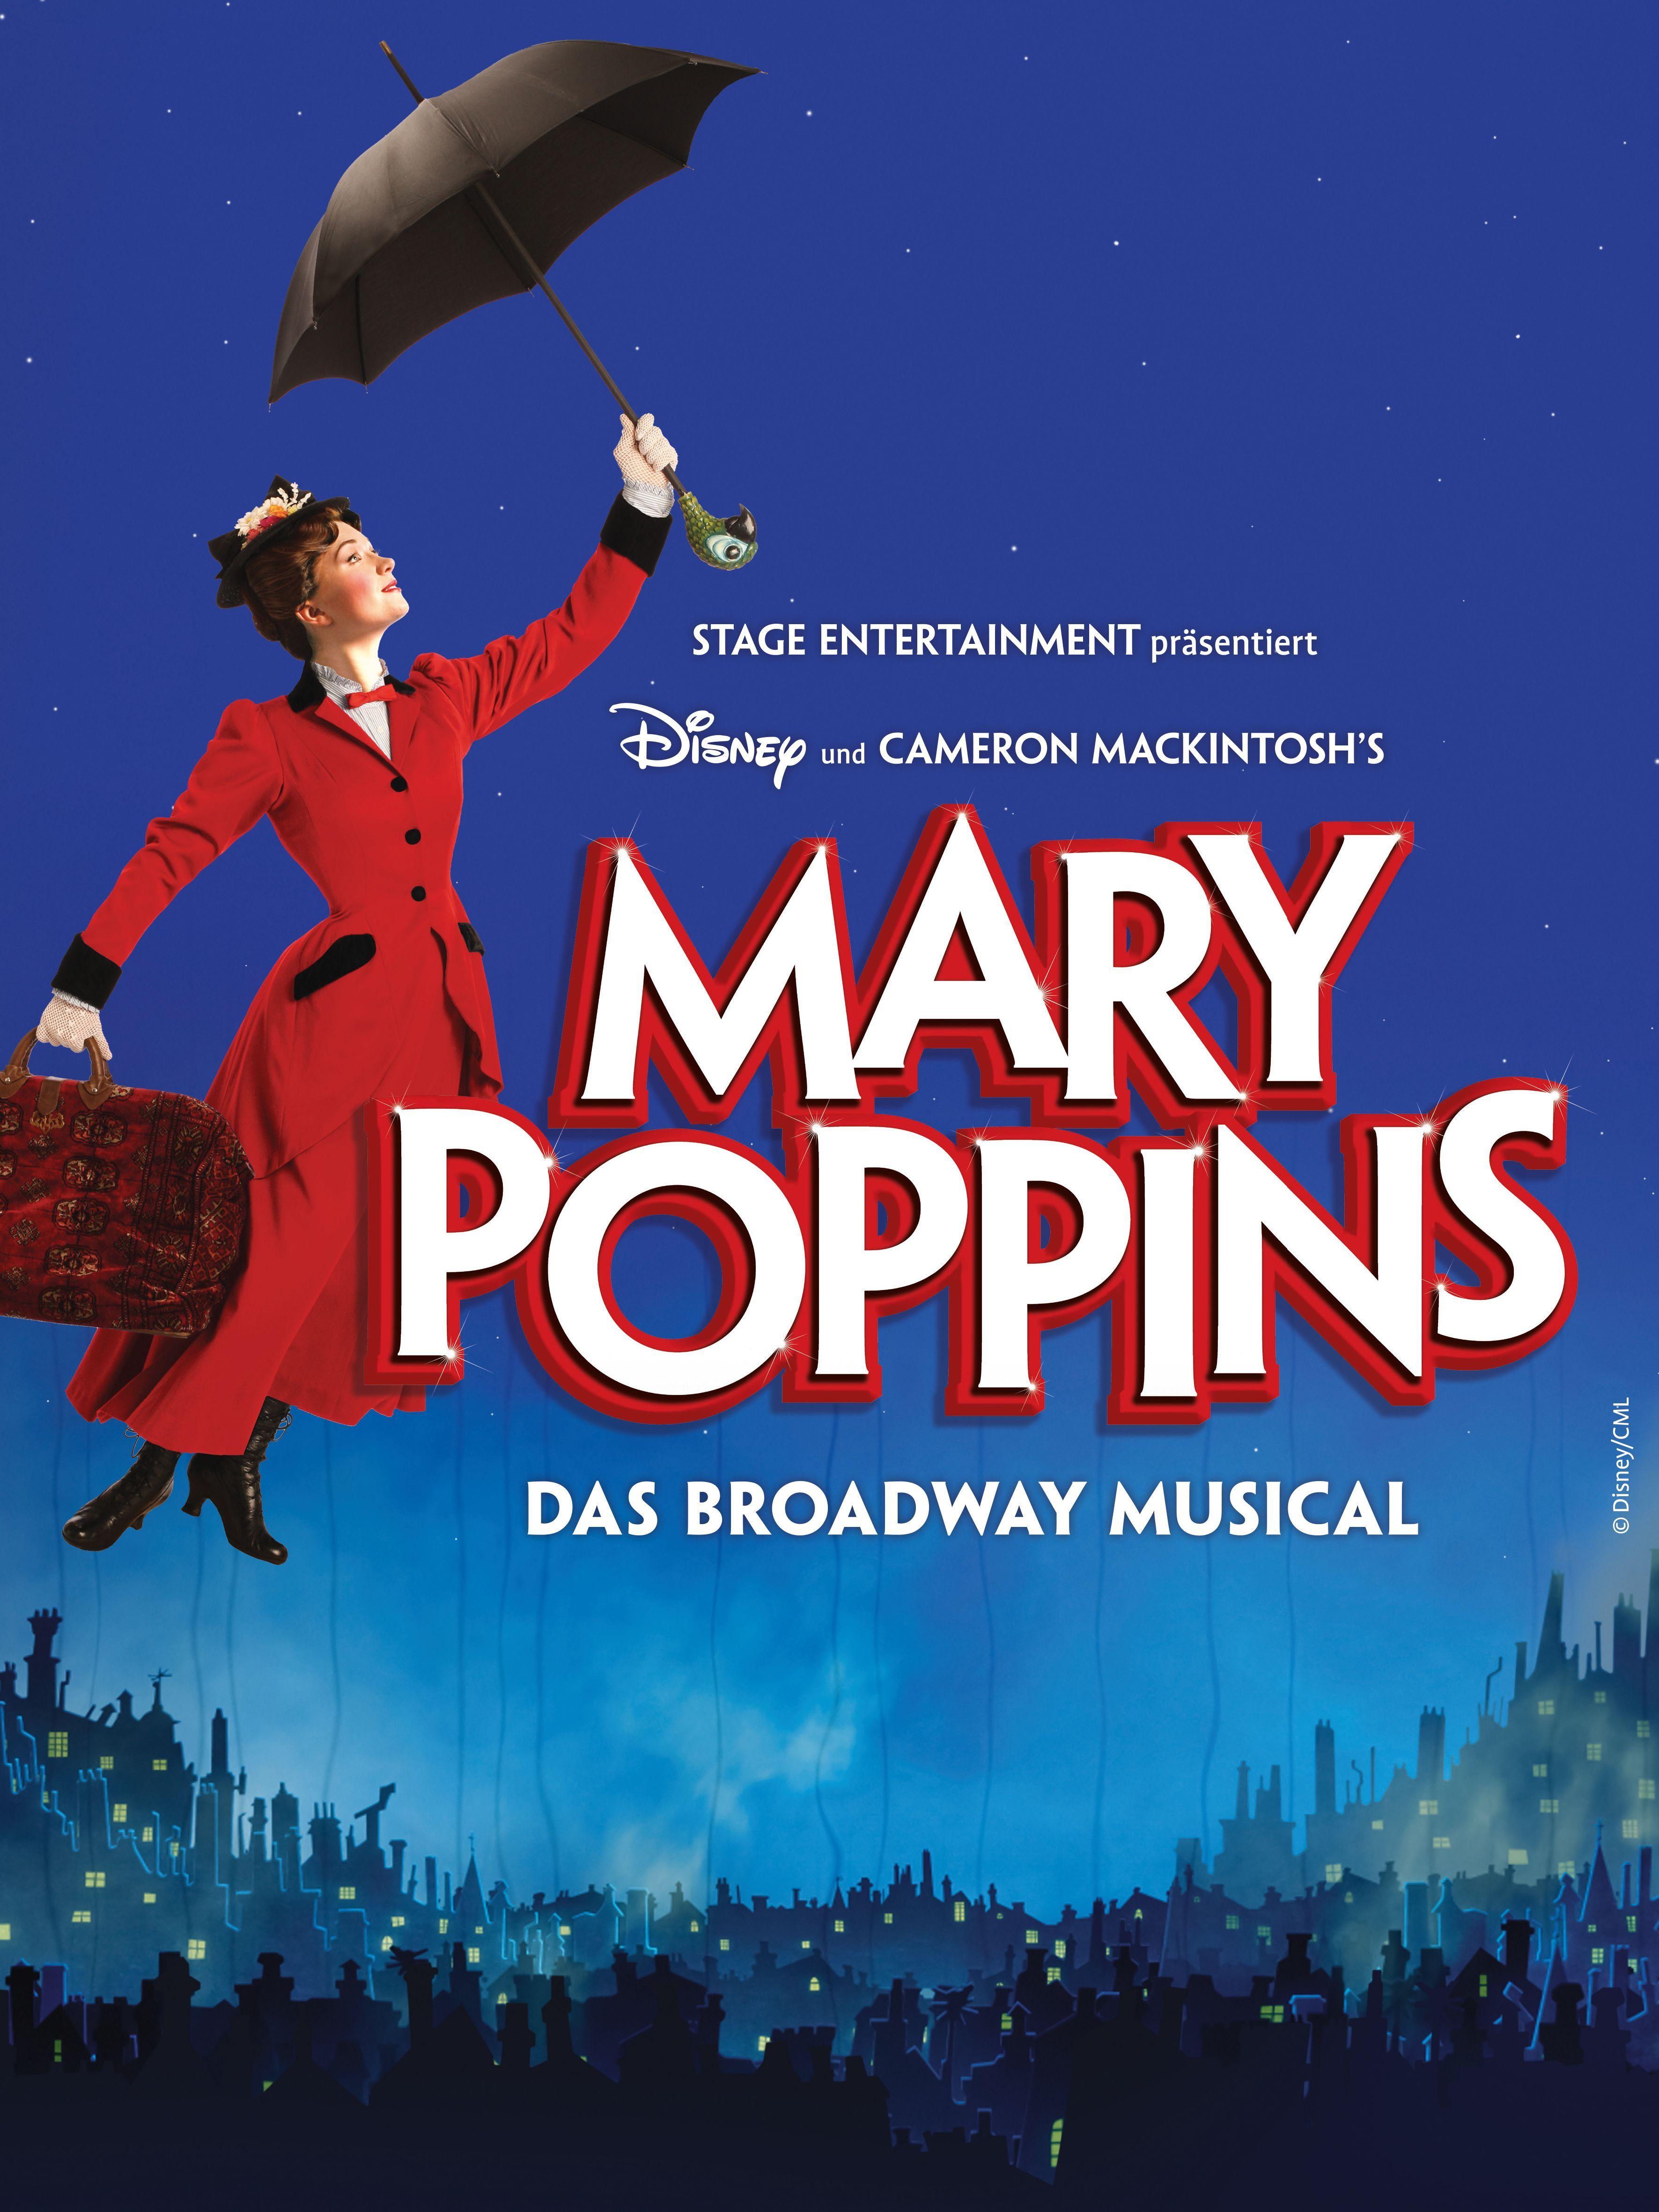 Unvergessliche Momente In Disneys Broadwayklassiker Mary Poppins In Hamburg Musical Mary Poppins Musical Musical In Hamburg